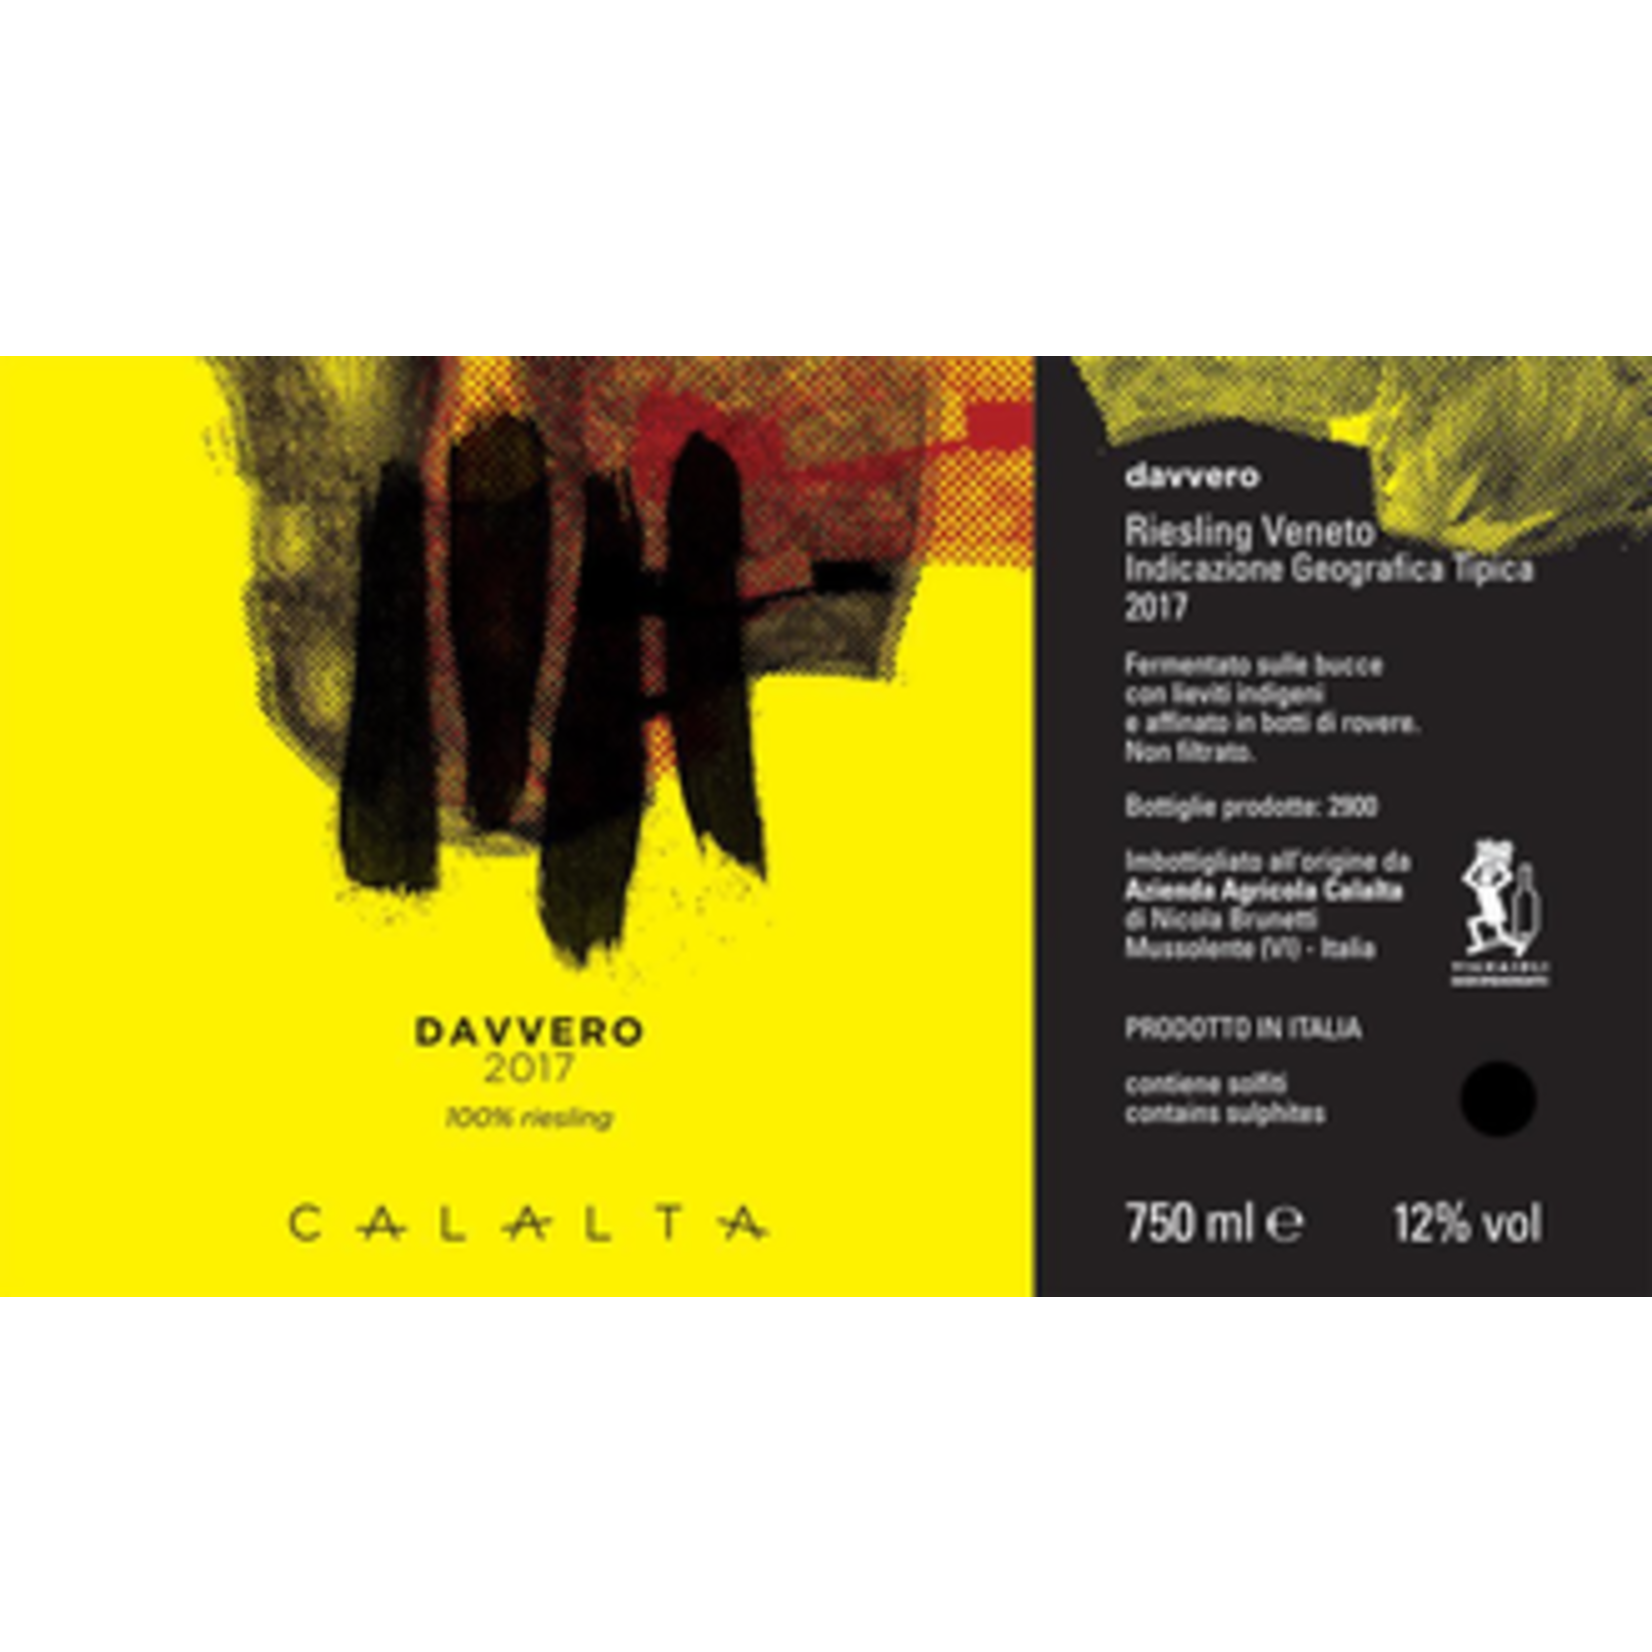 Wine Calalta Davvero Riesling 2019 1.5L